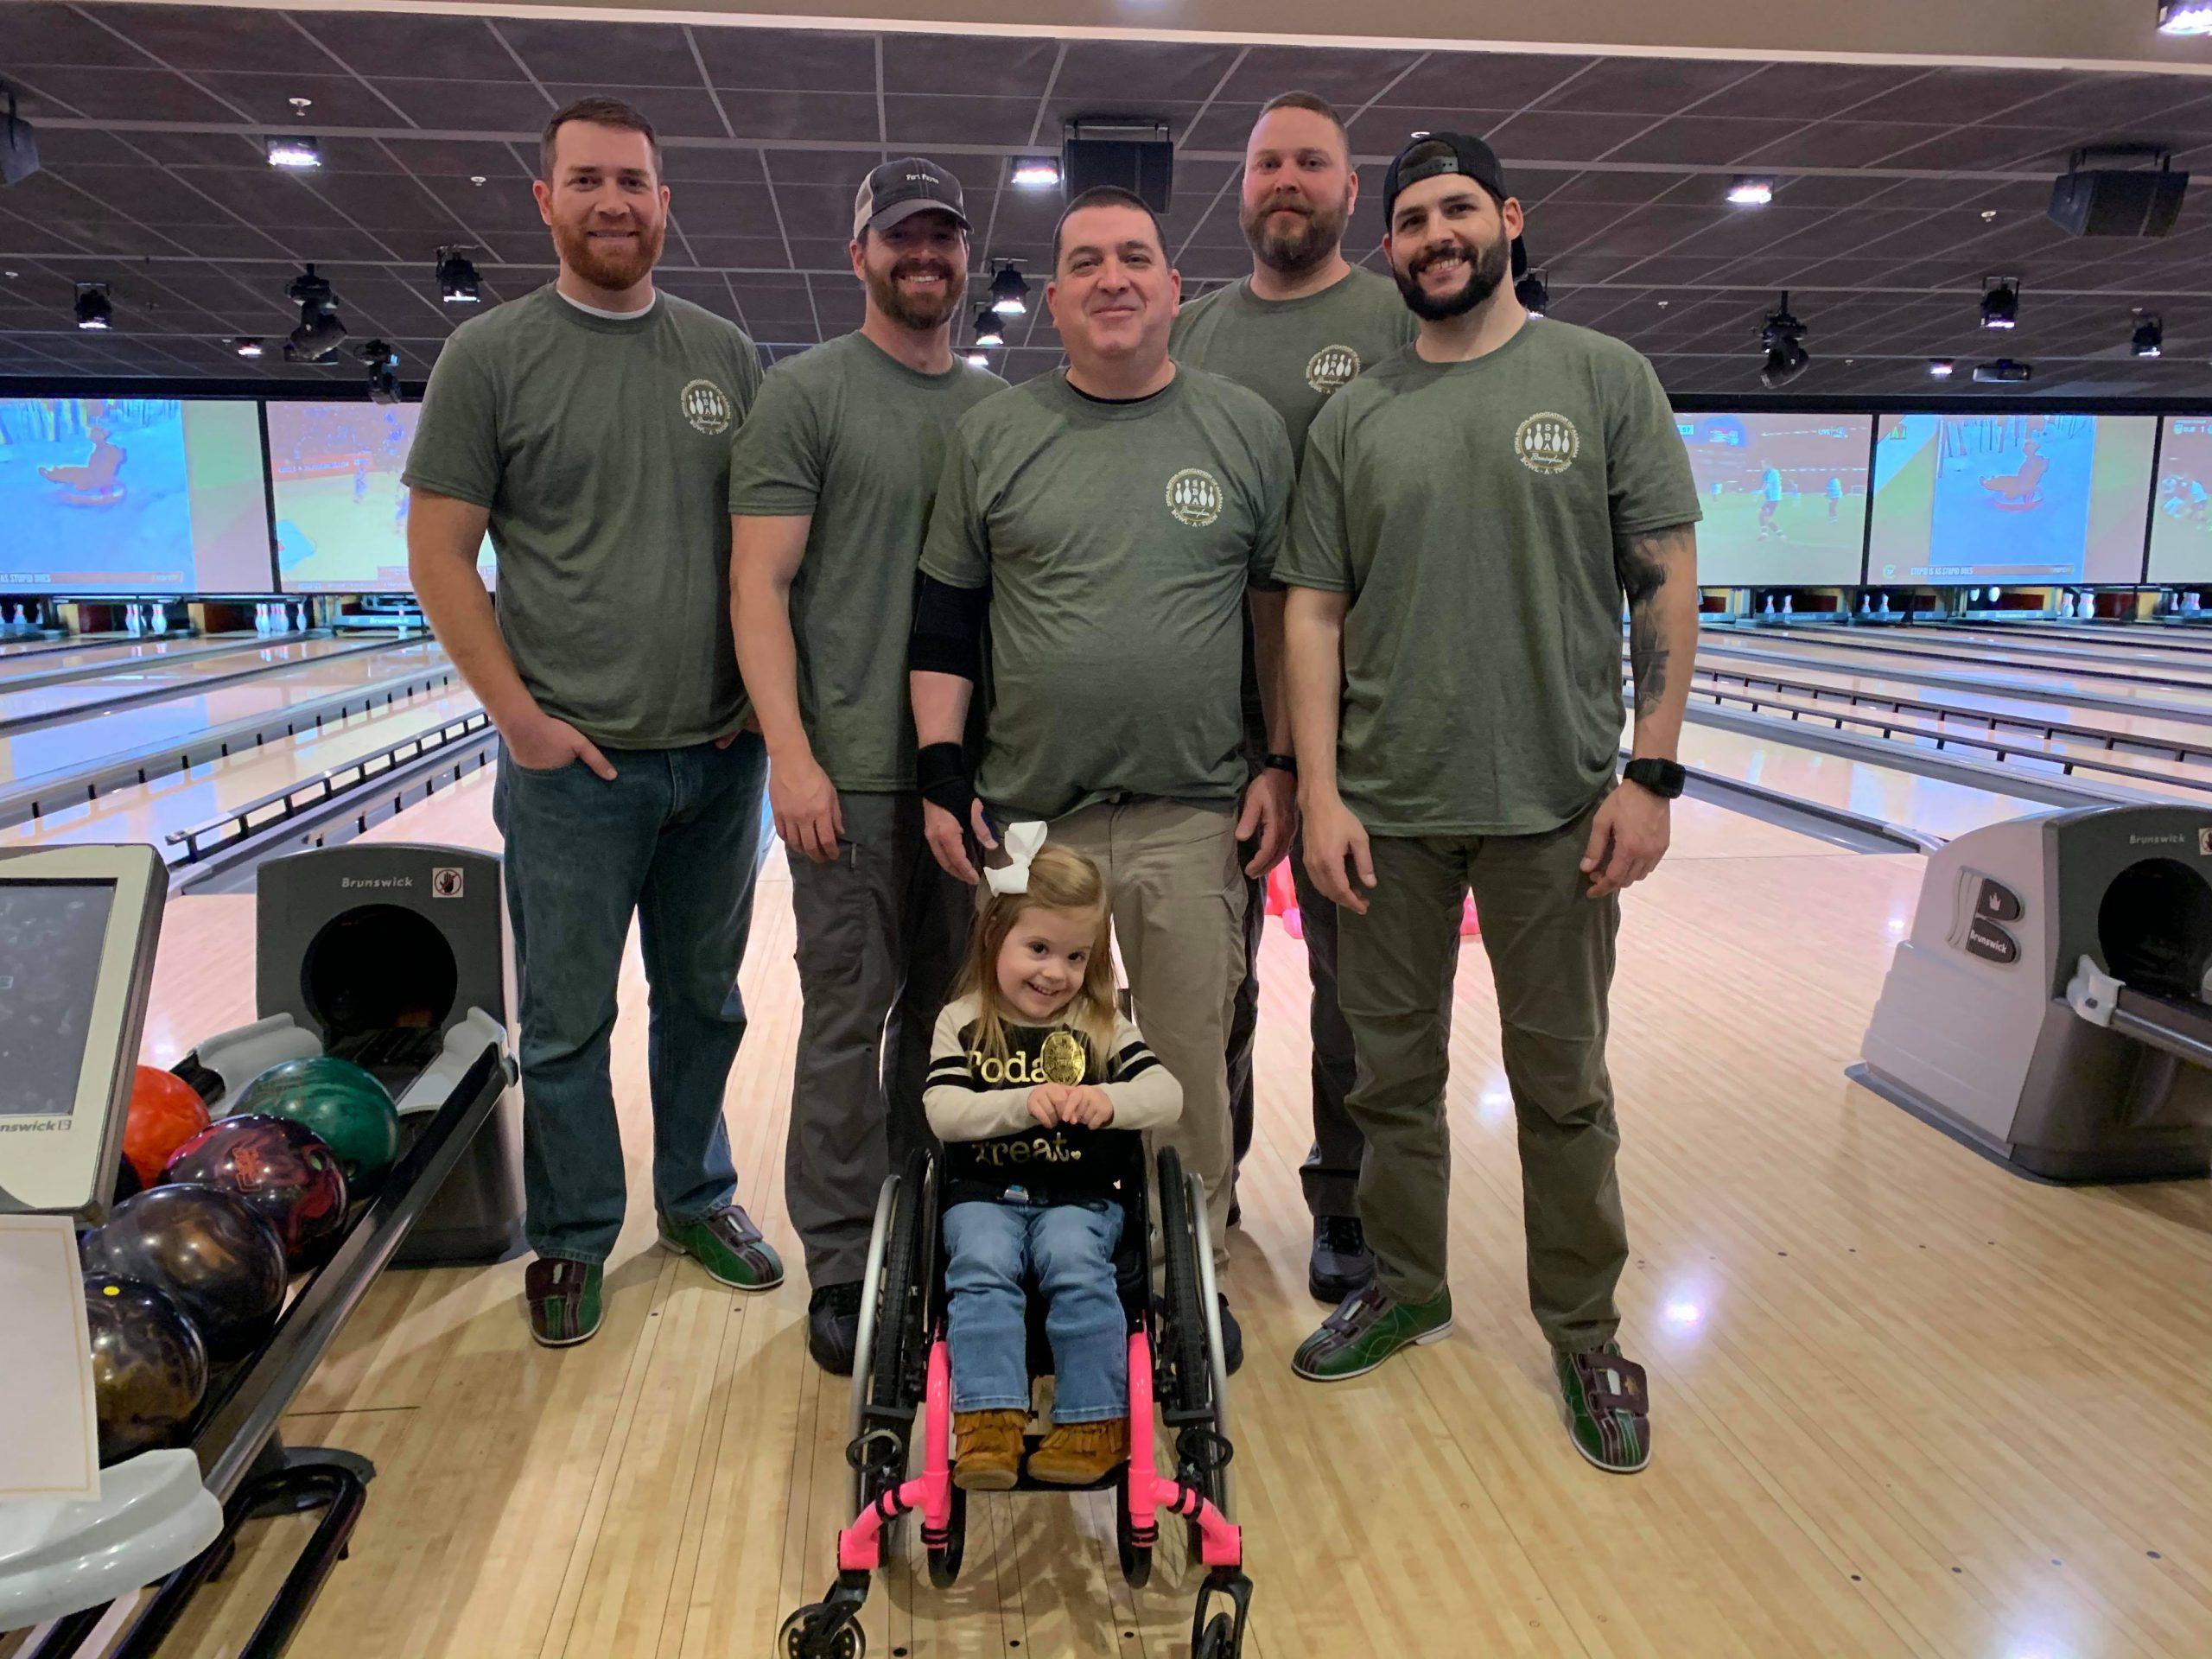 Trussville PD participates in Birmingham Bowl-a-Thon to benefit Spina Bifida Association of Alabama